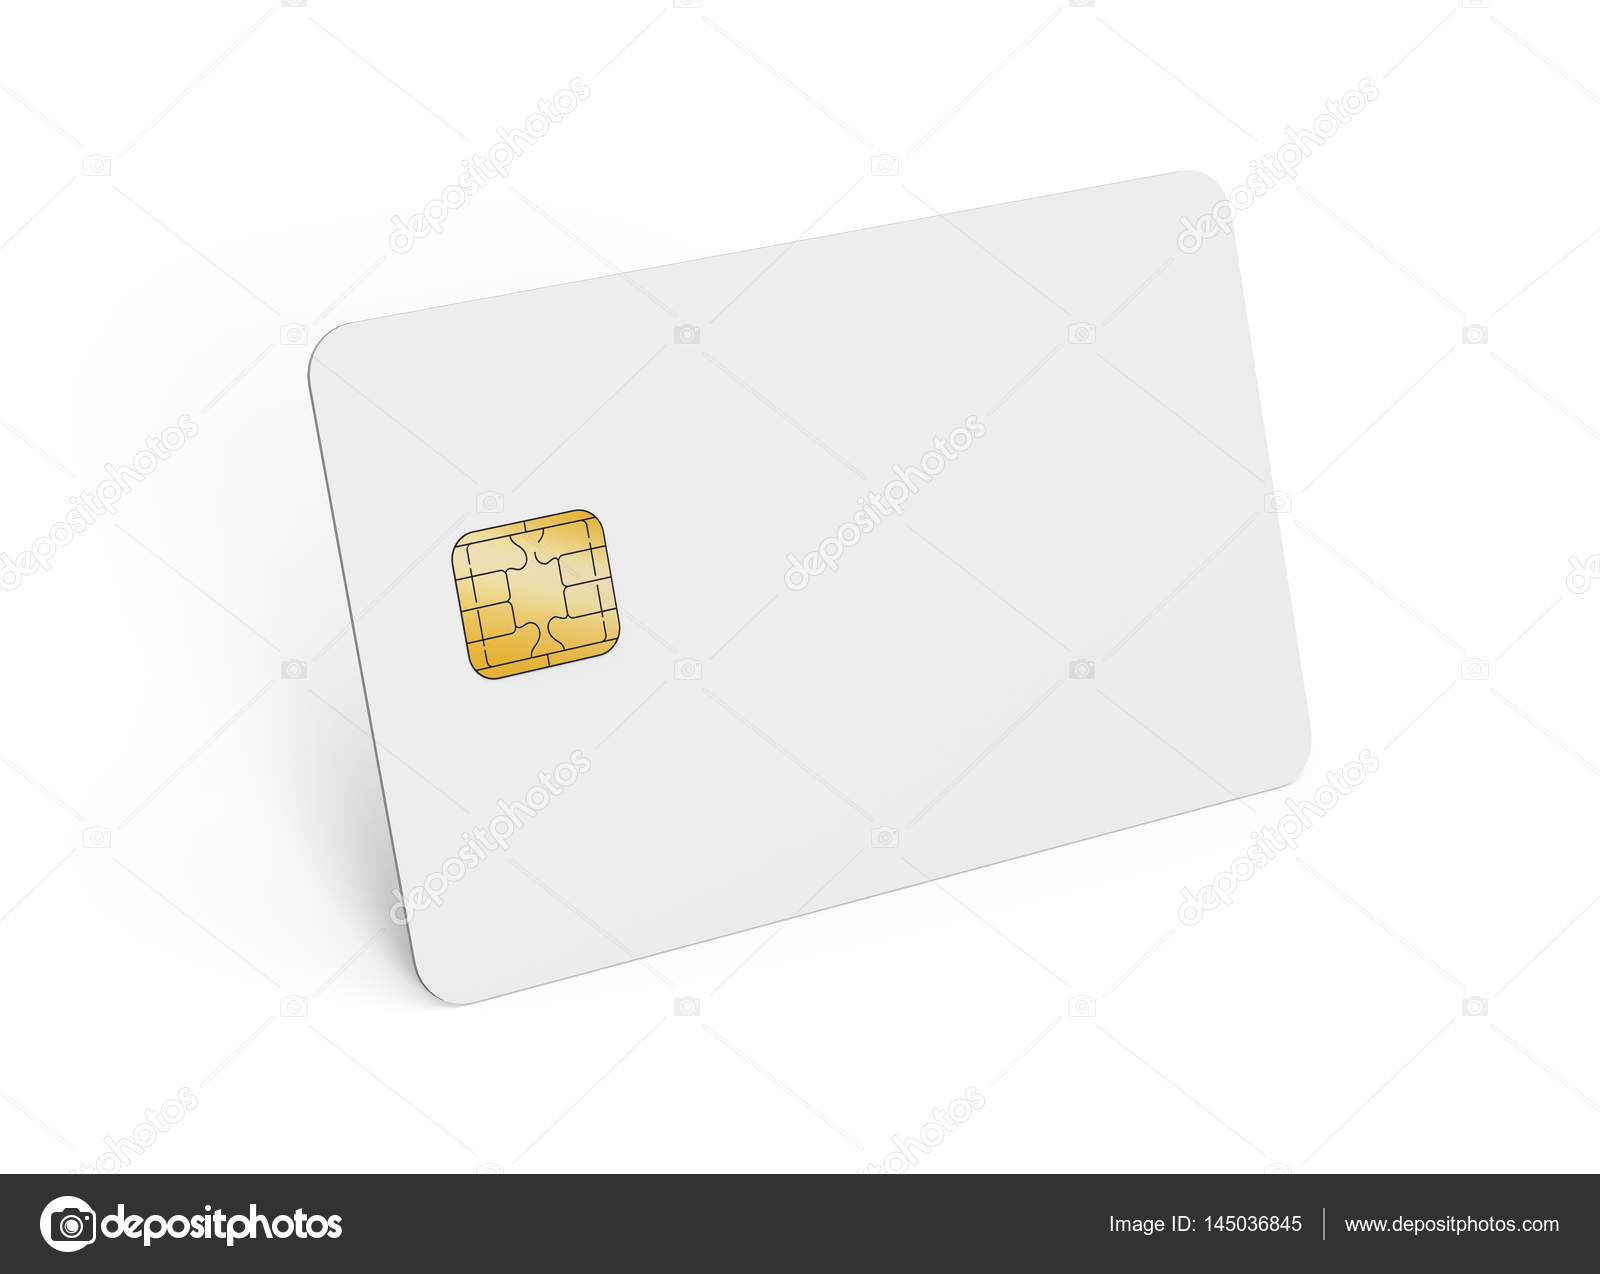 Leere Kreditkarte Vorlage — Stockfoto © HstrongART #145036845